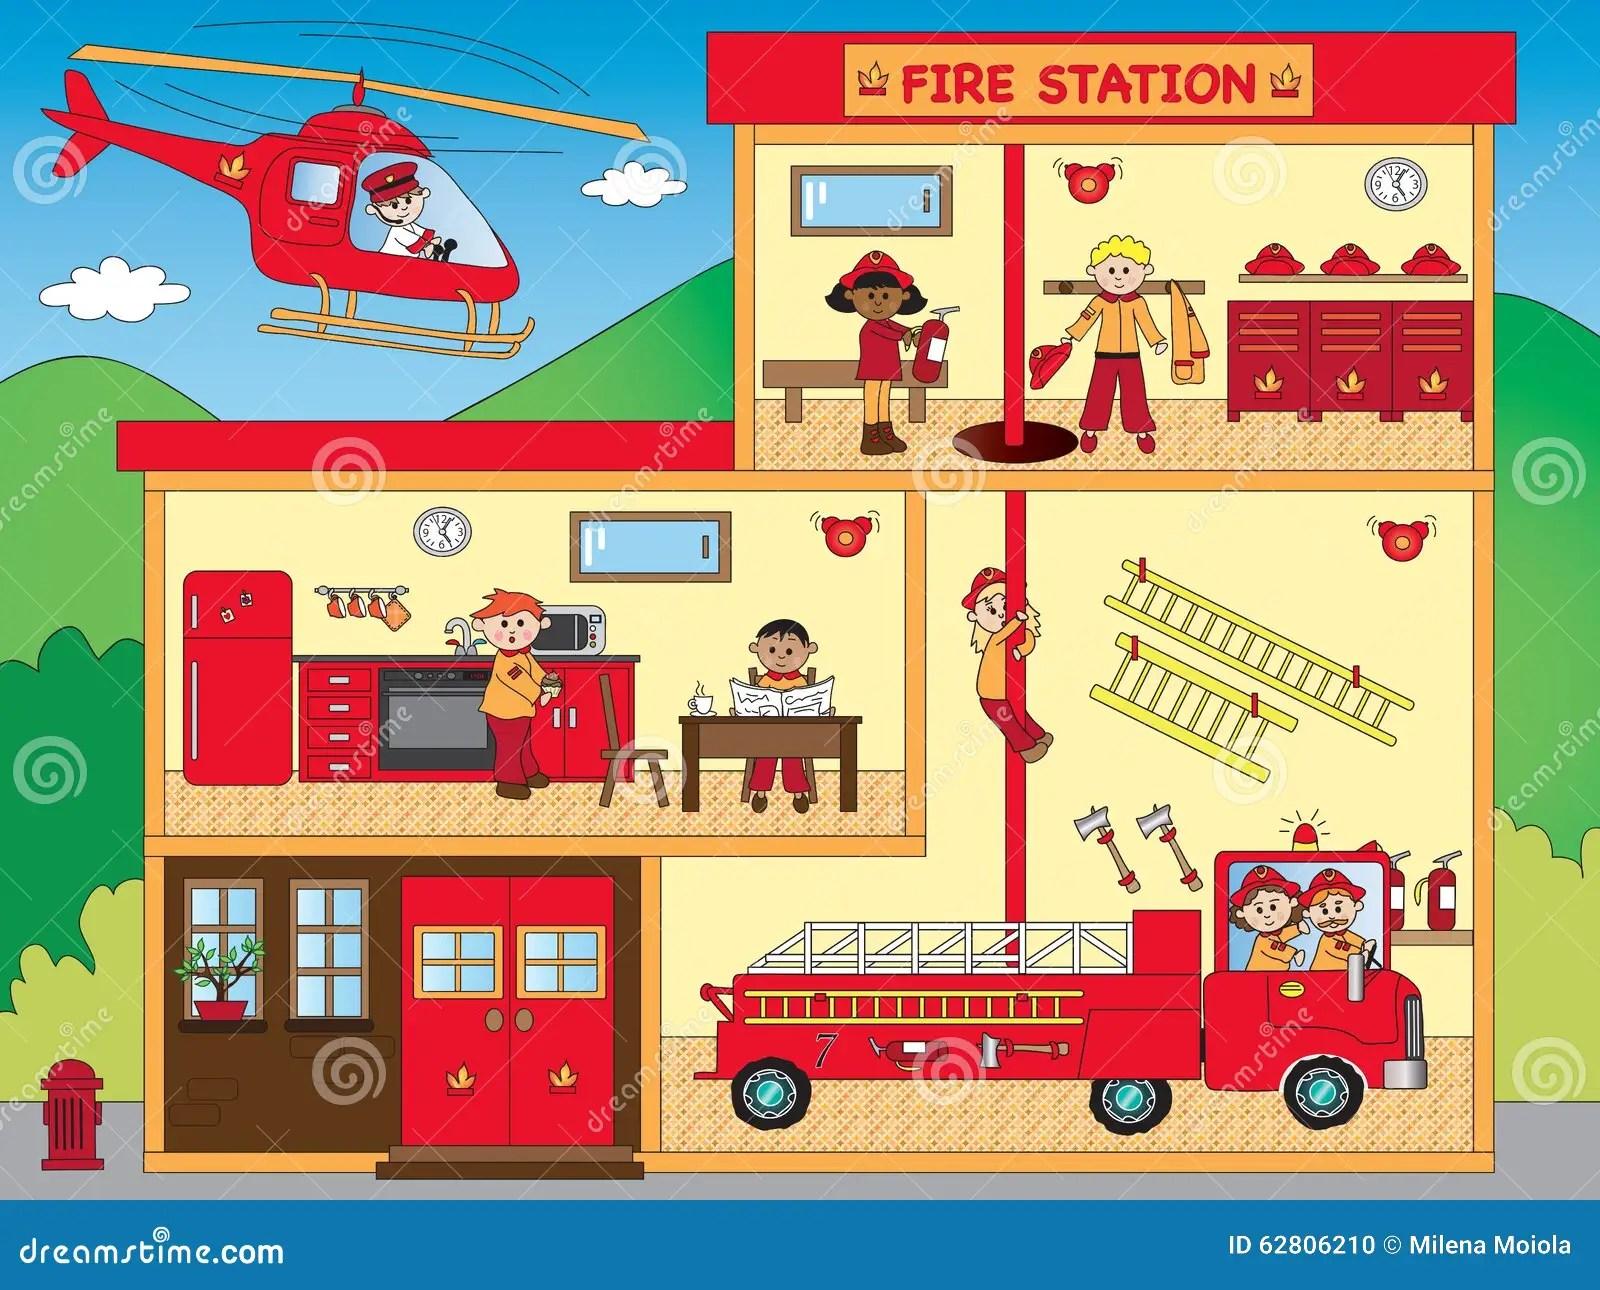 hight resolution of illustration of interior of fire station